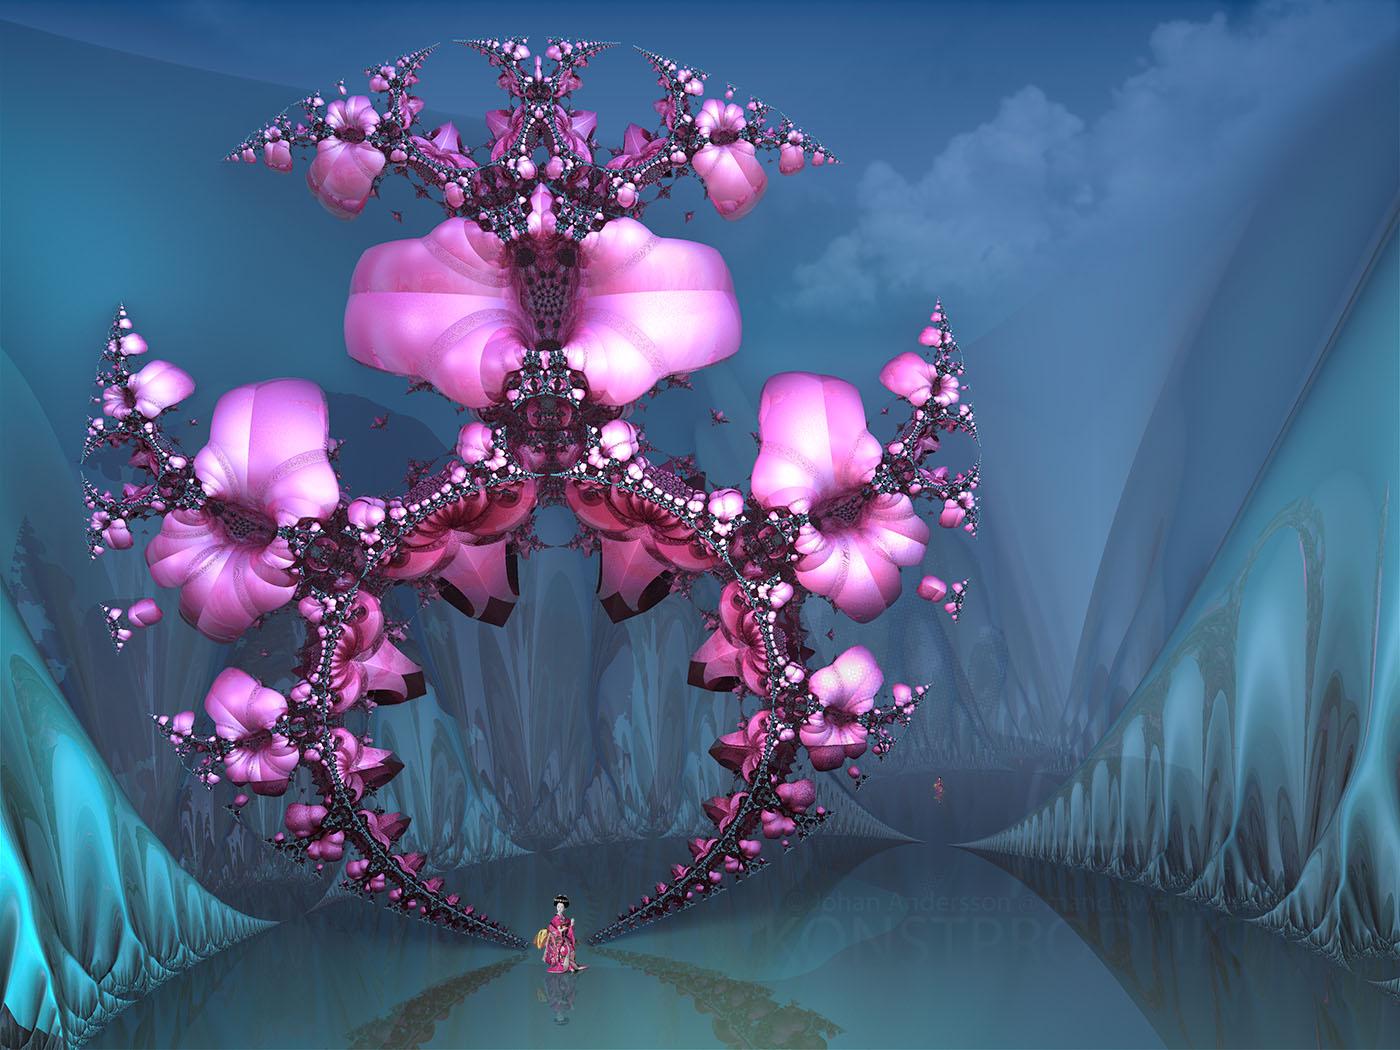 Geishas Cherry Blossom Tree - at the Ecstasy... by MANDELWERK